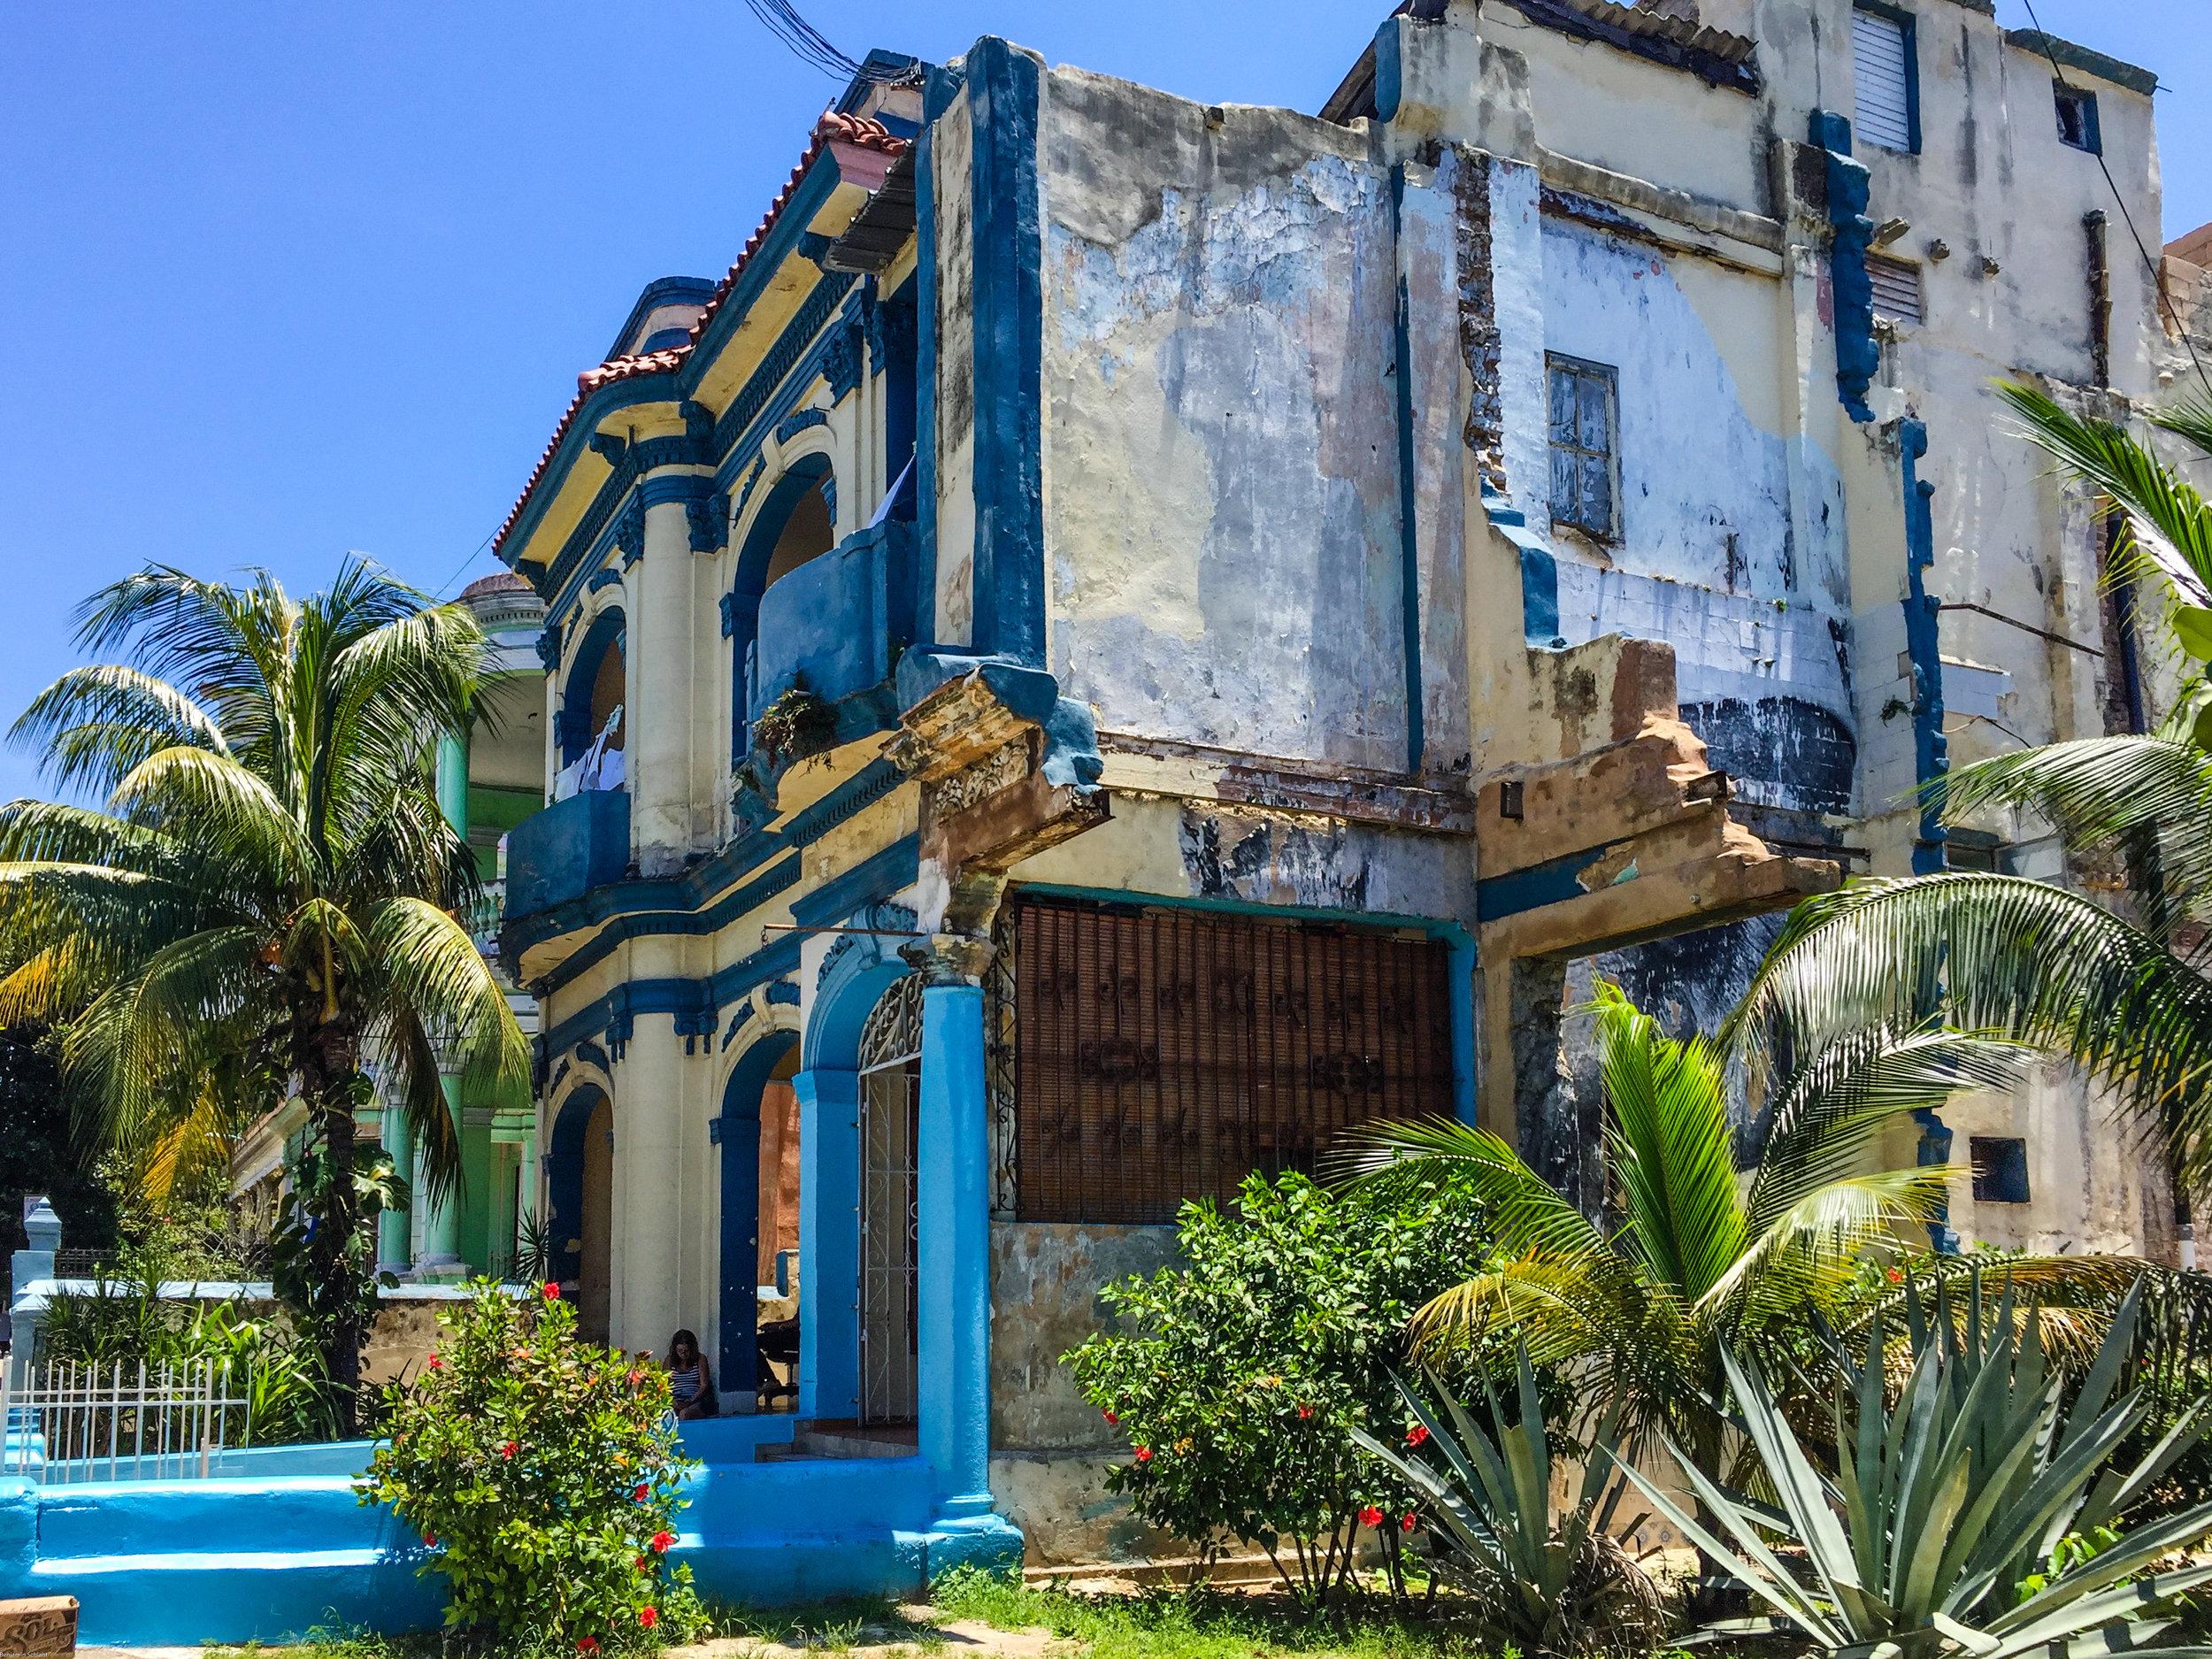 A crumbling blue house in Havana.